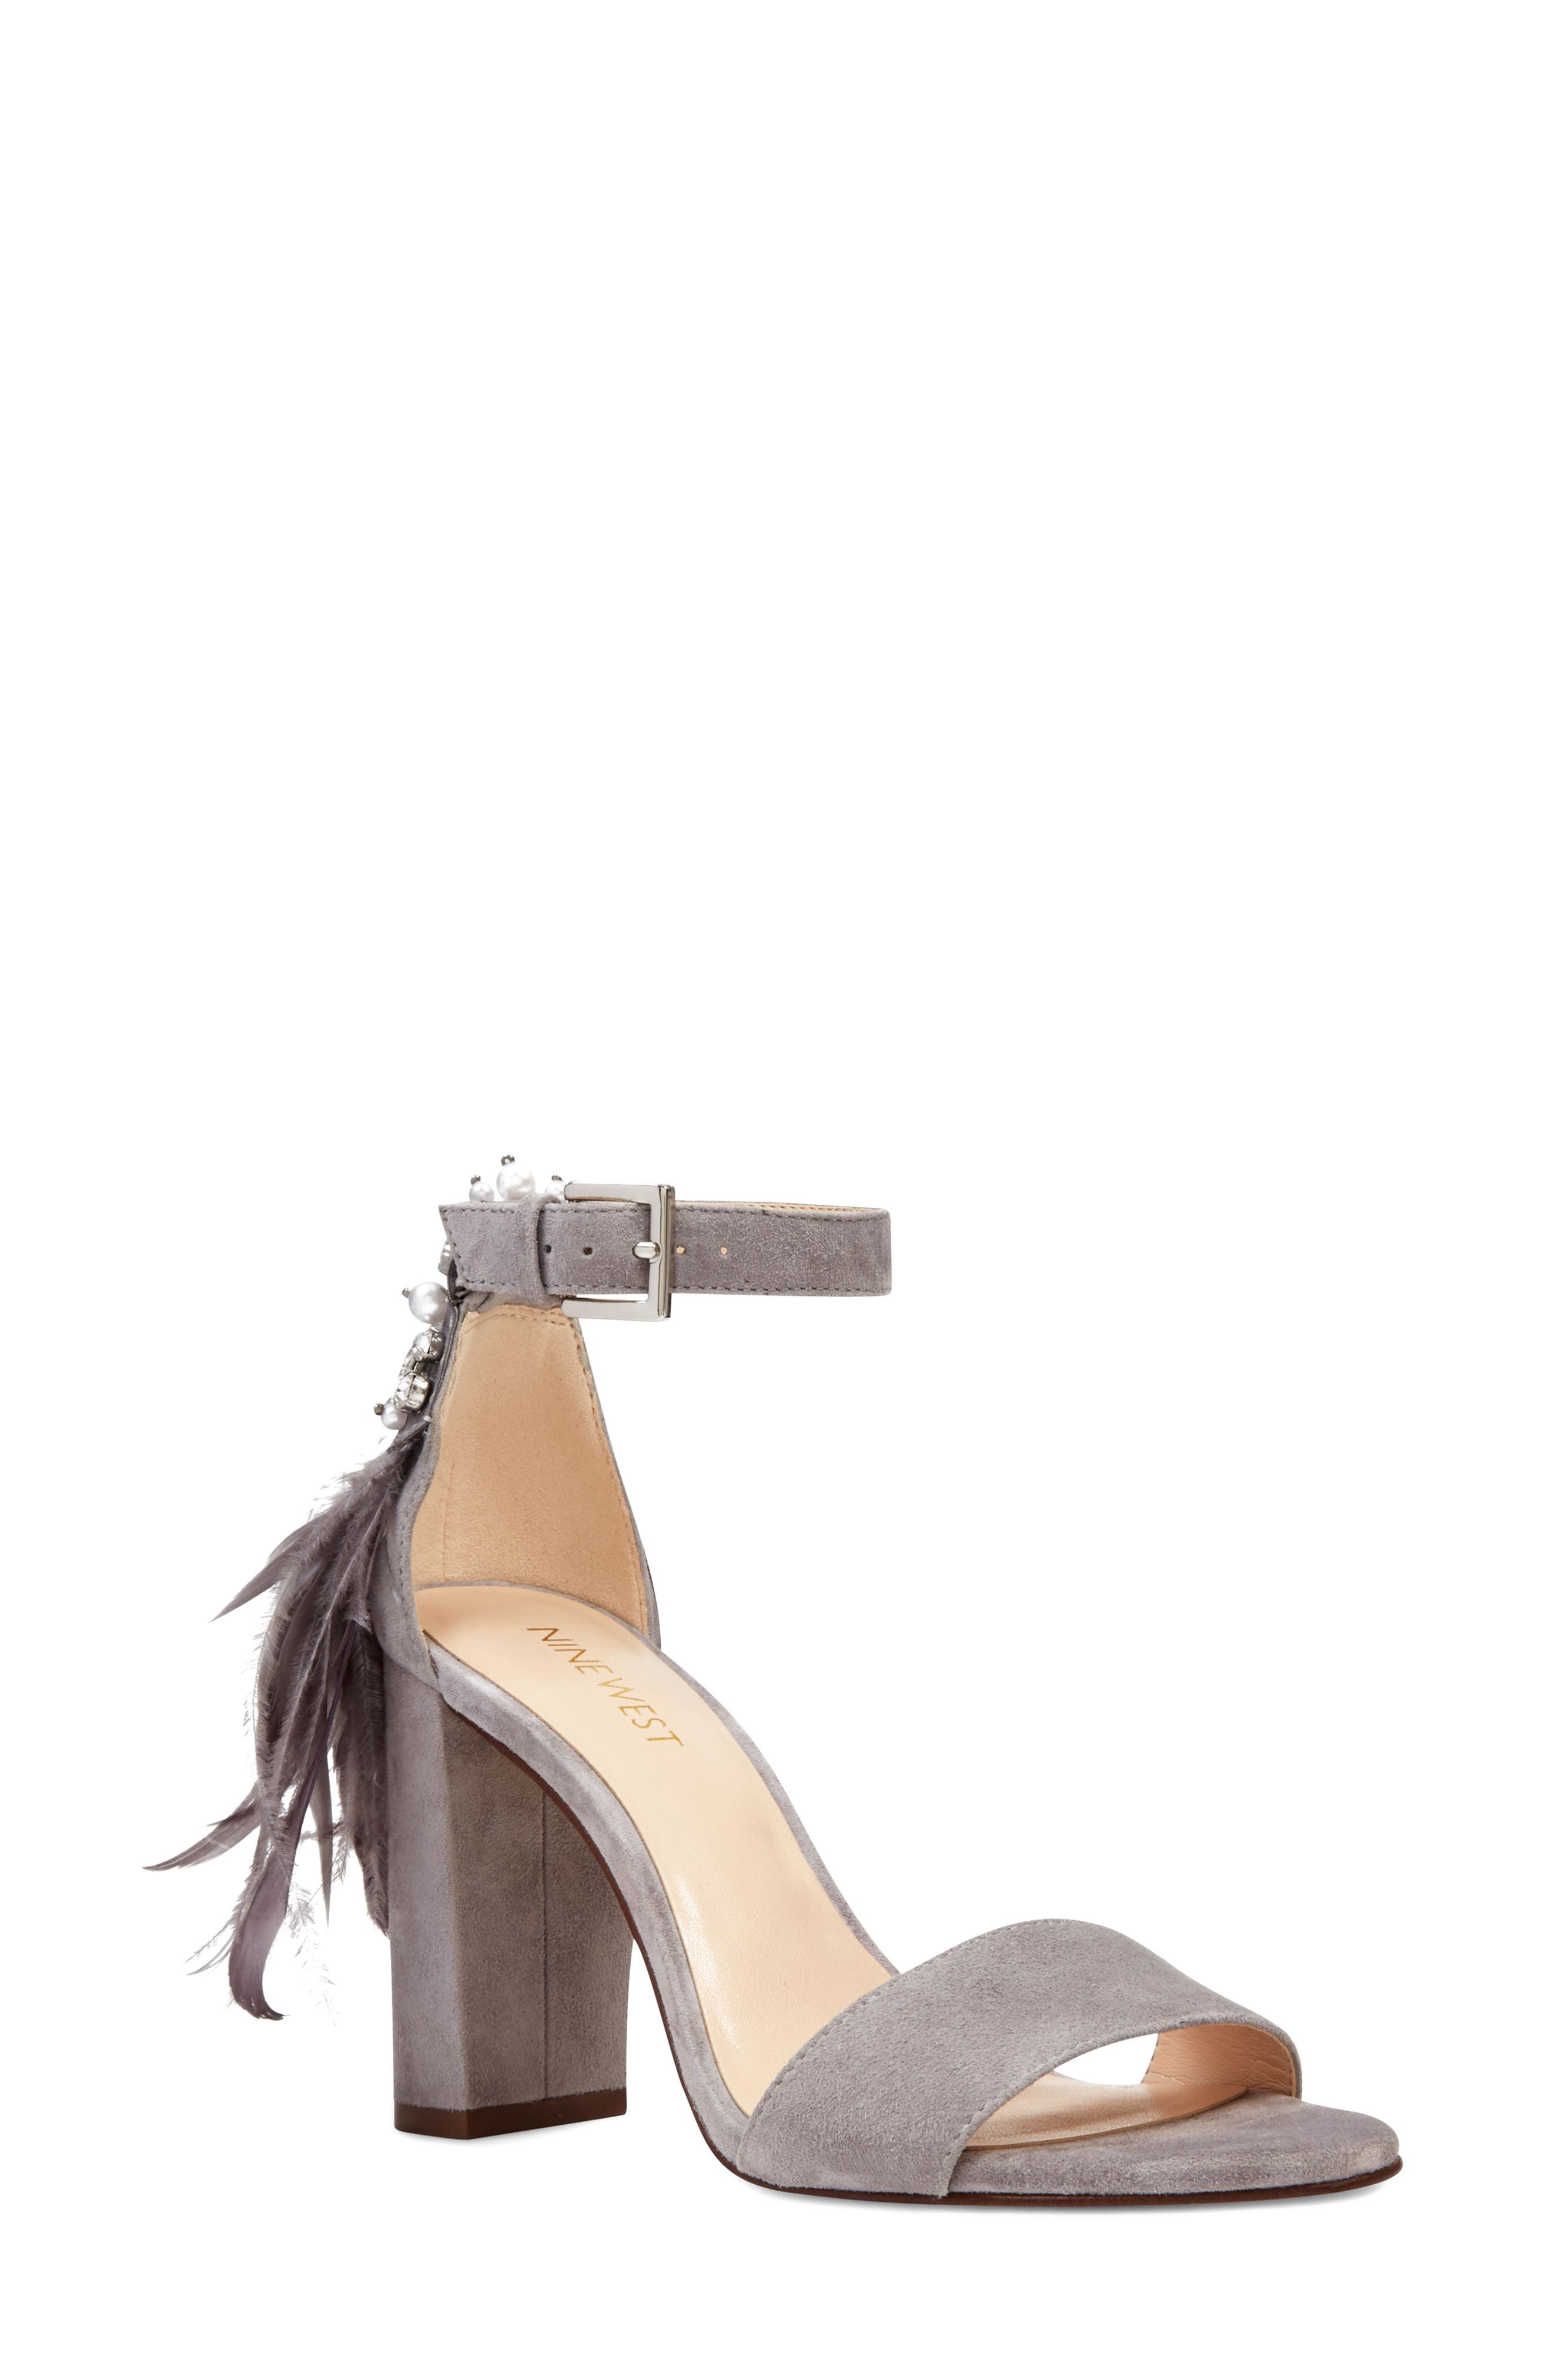 Alternate Image 1 Selected - Nine West Aaronita Feather Block Heel Sandal (Women)